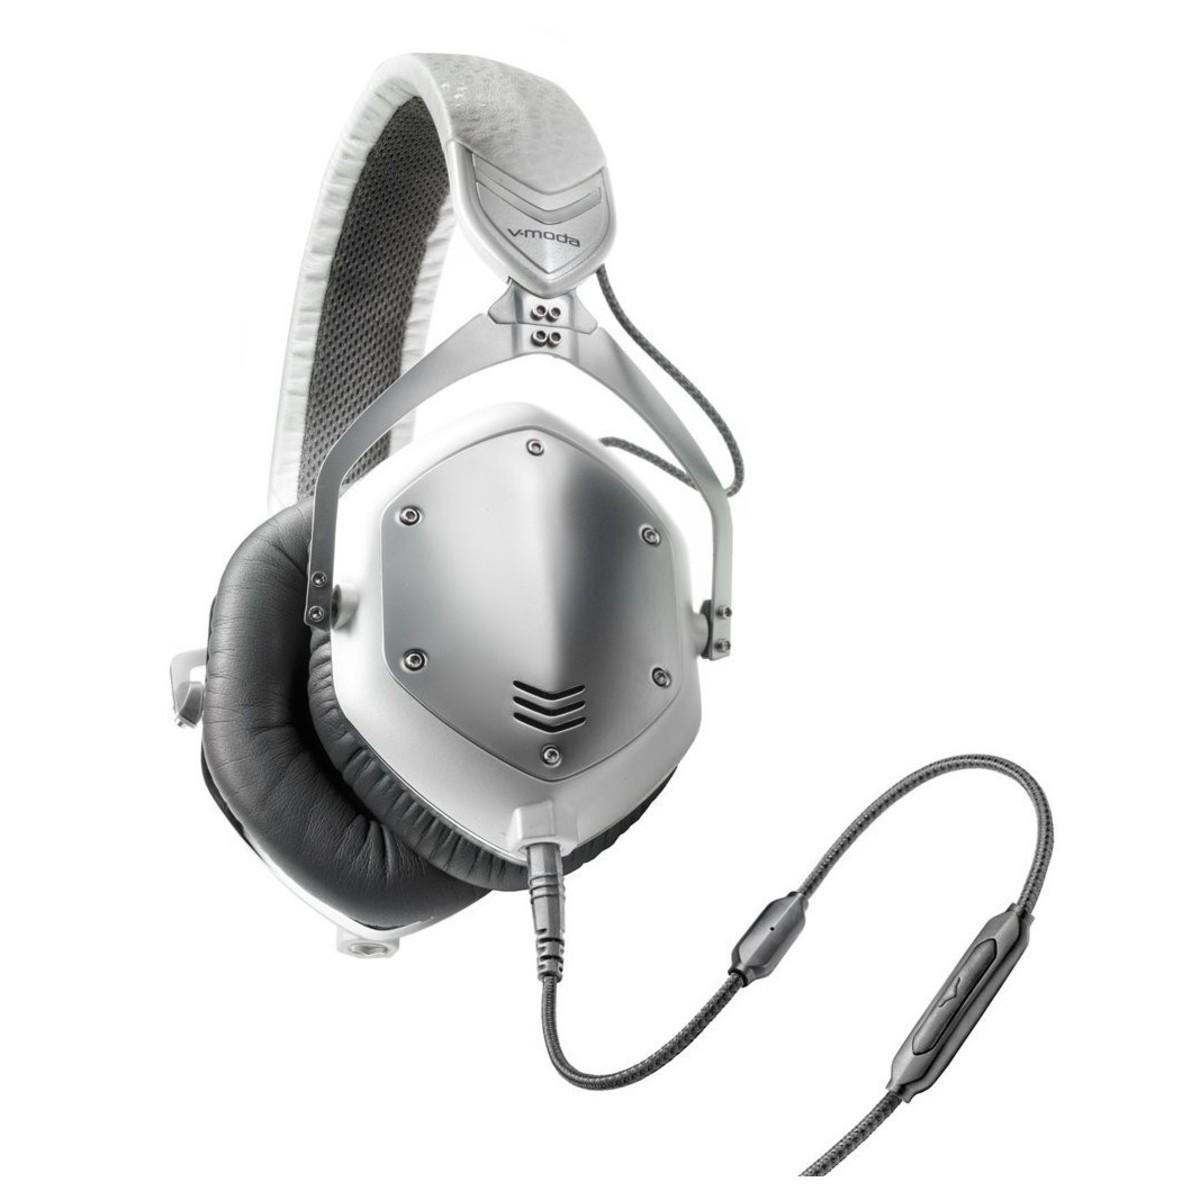 Shop now | V-Moda M-100 Crossfade Headphones, White Silver